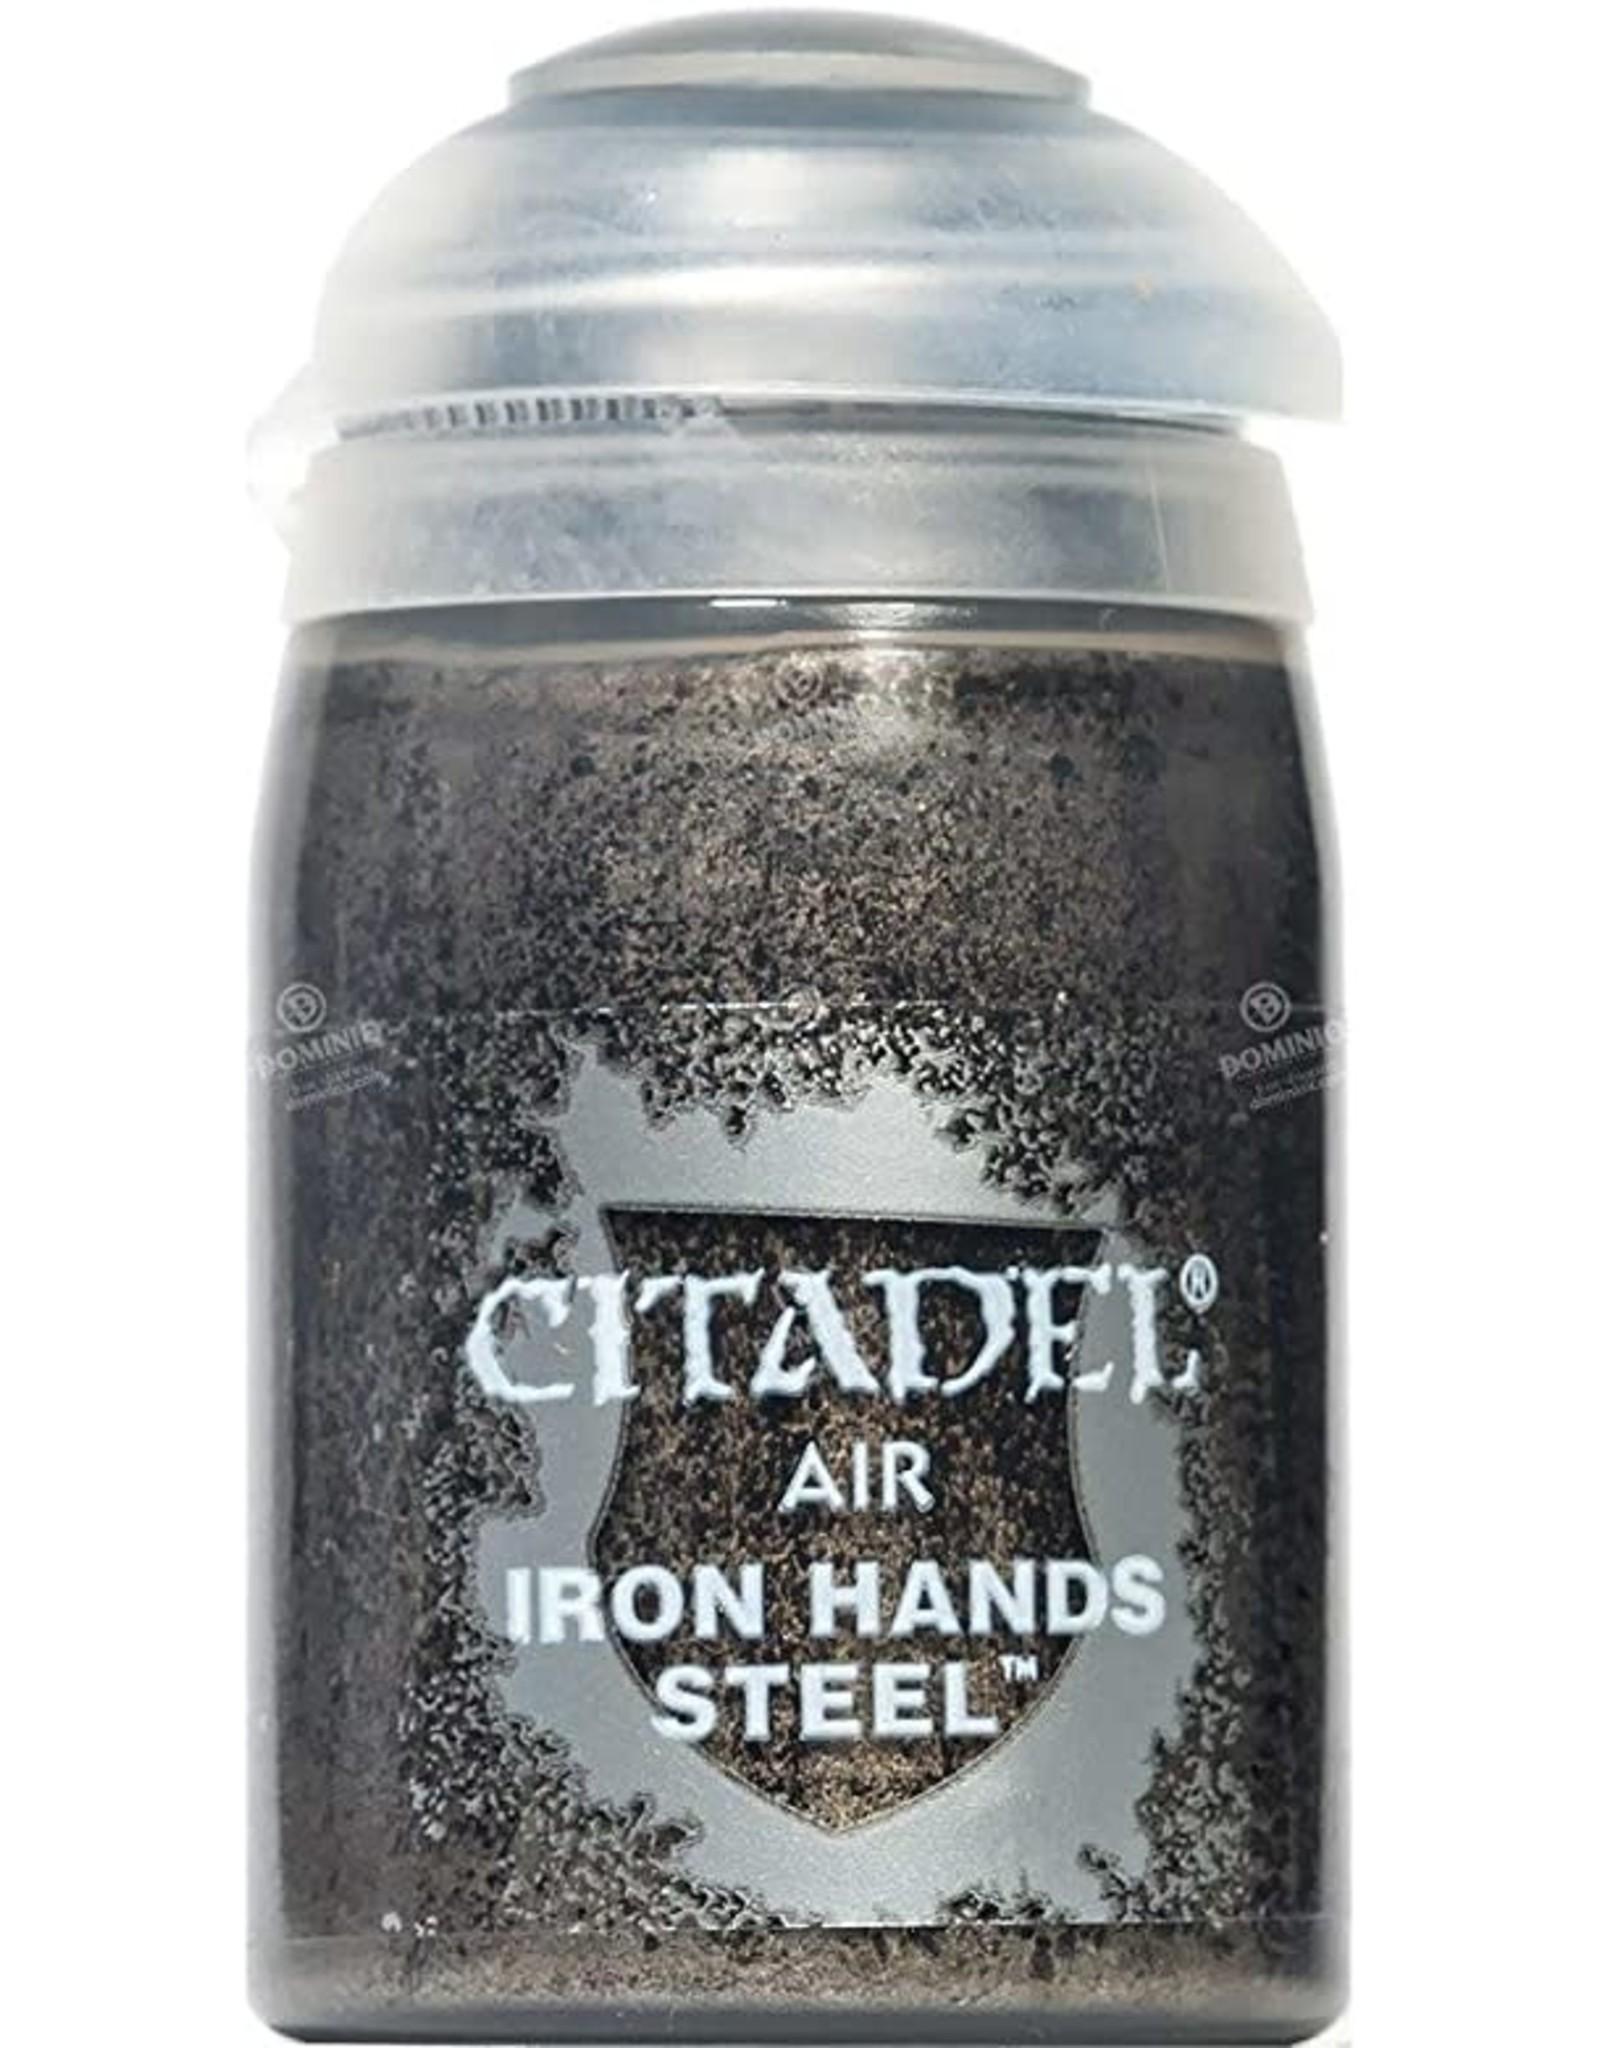 Games Workshop Citadel Paint: Iron Hands Steel Air (24 ml)